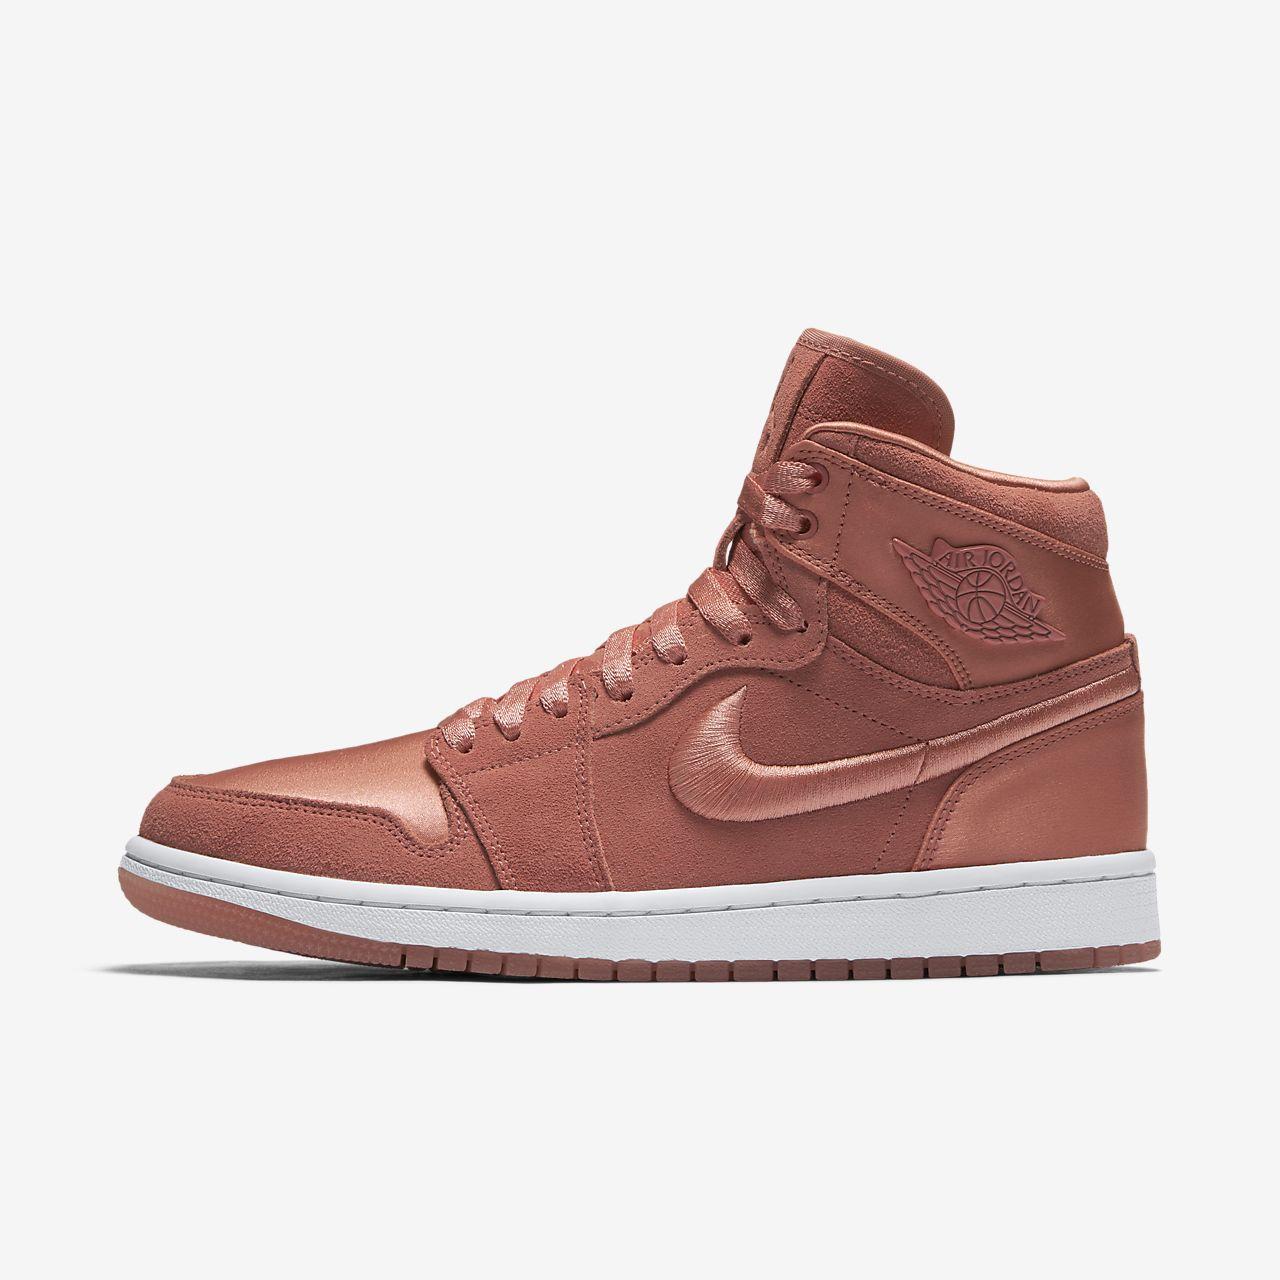 pretty nice 065e2 62434 Air Jordan 1 Retro High Women s Shoe